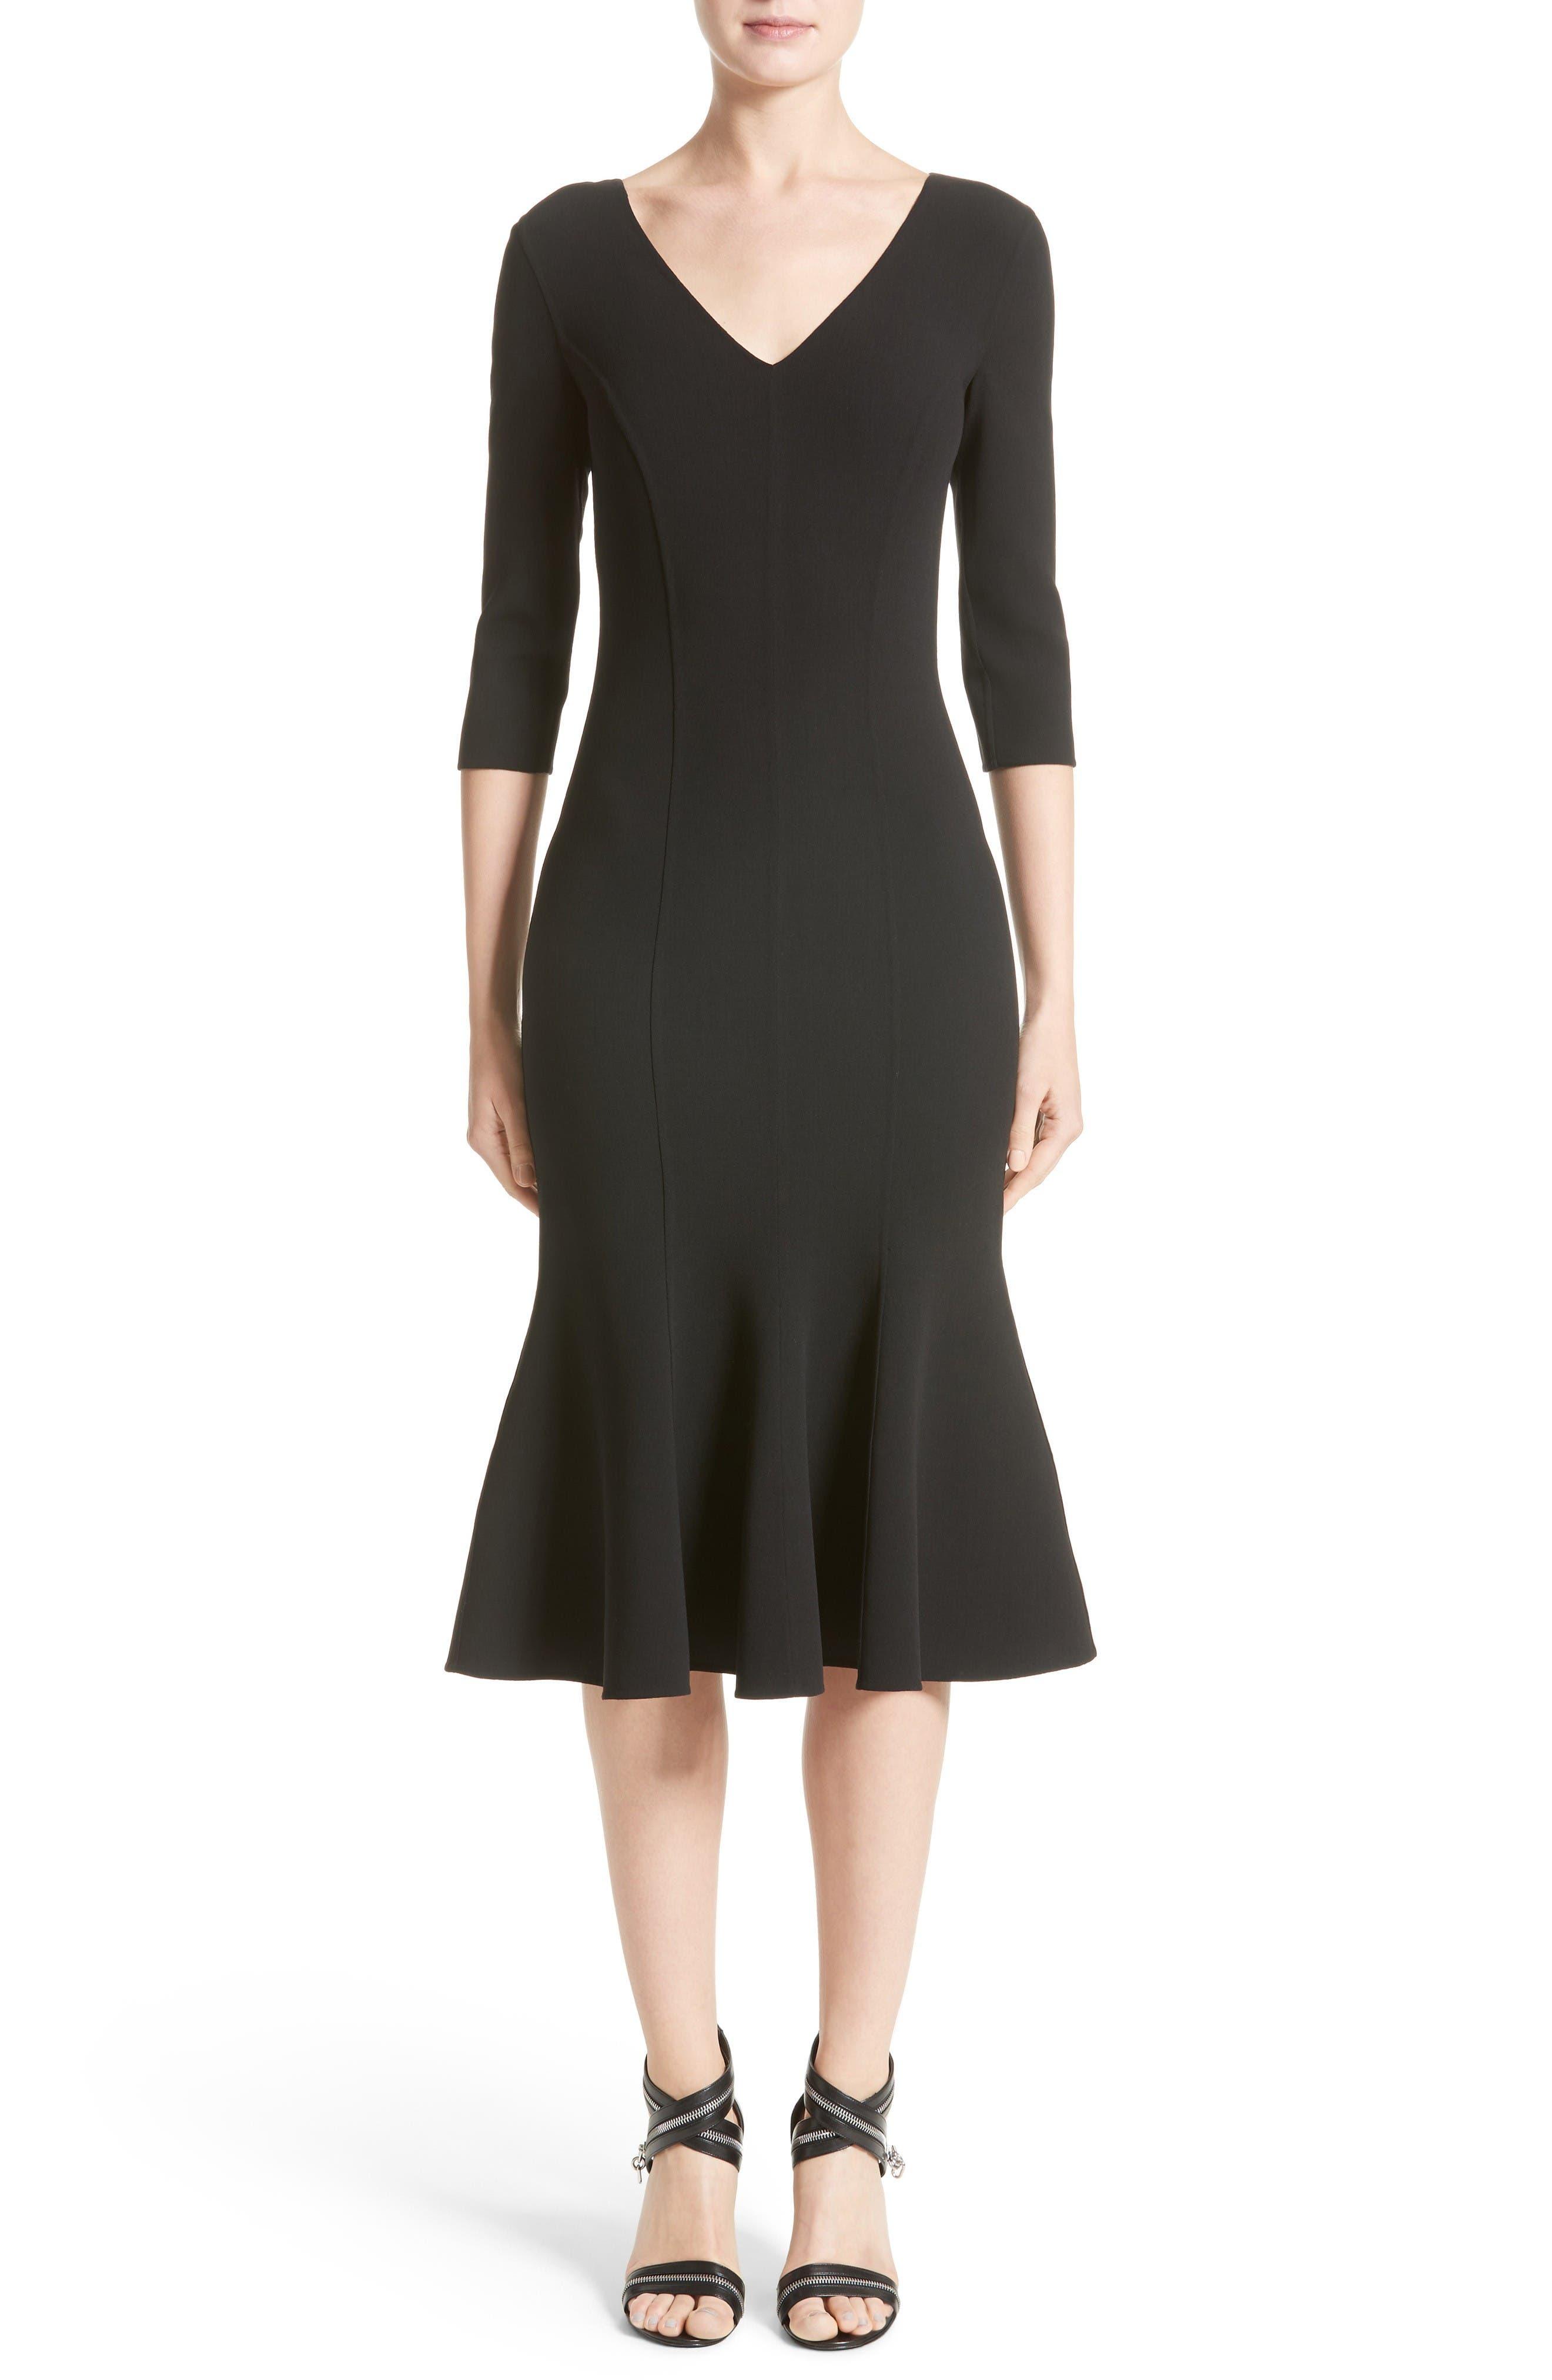 Alternate Image 1 Selected - Michael Kors Stretch Wool Crepe Flounce Dress